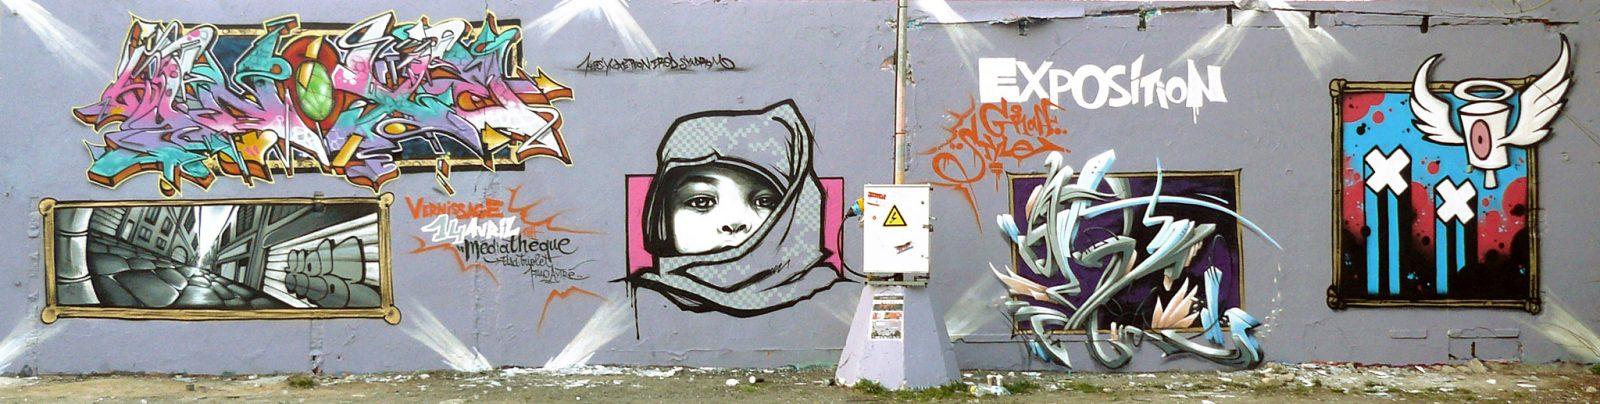 expo-graffiti-mediatheque-aytre